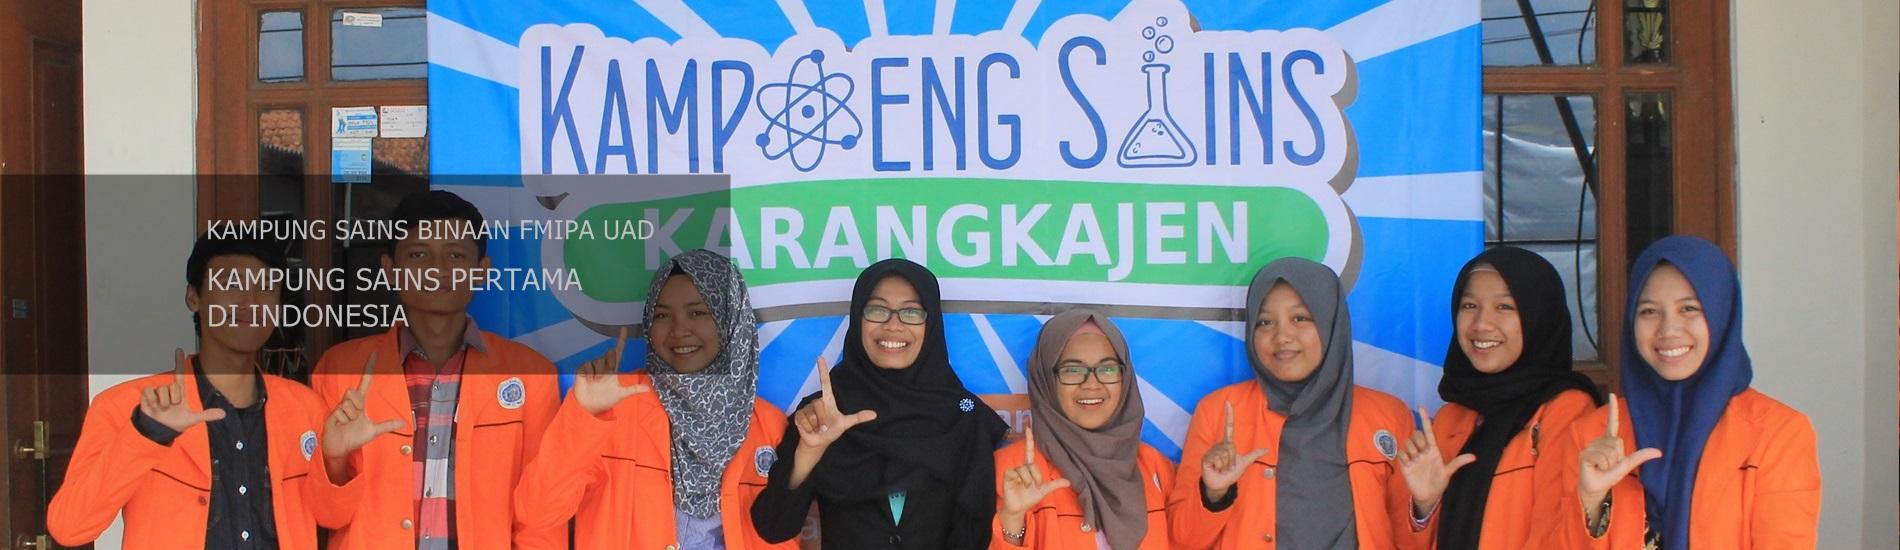 Slider Kampung Sains Binaan FMIPA UAD Pertama di Indonesia